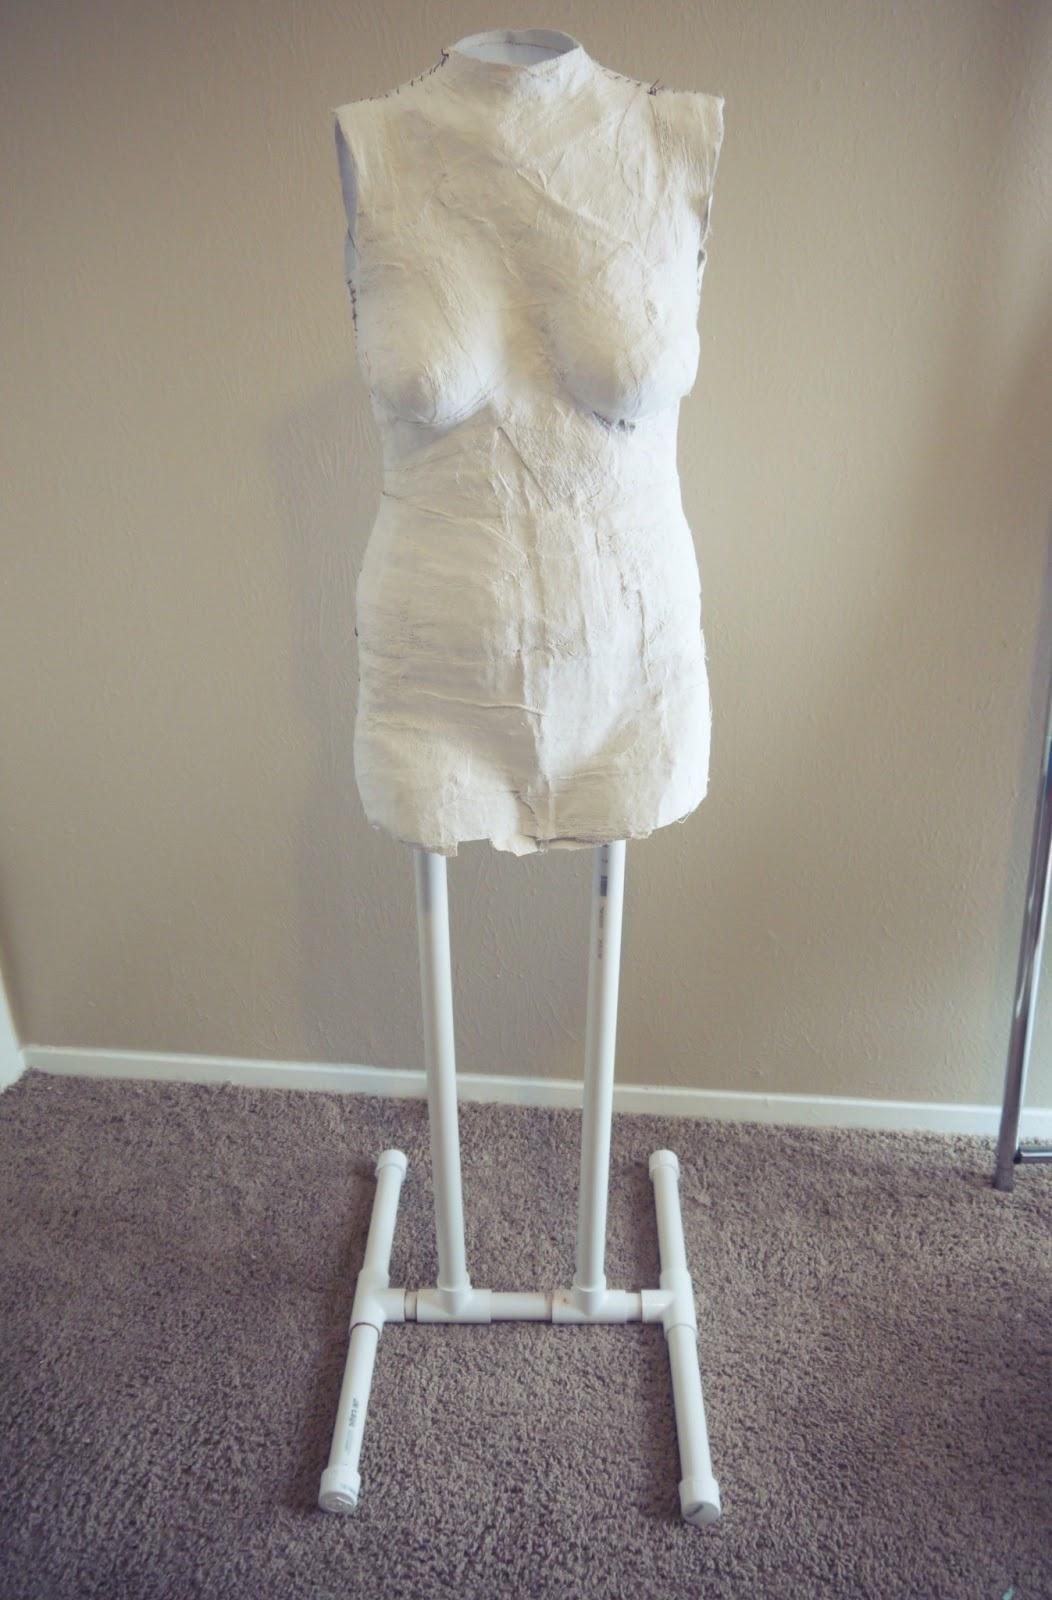 Katastrophic diy dress form tutorial part 2 building the for Styrofoam forms